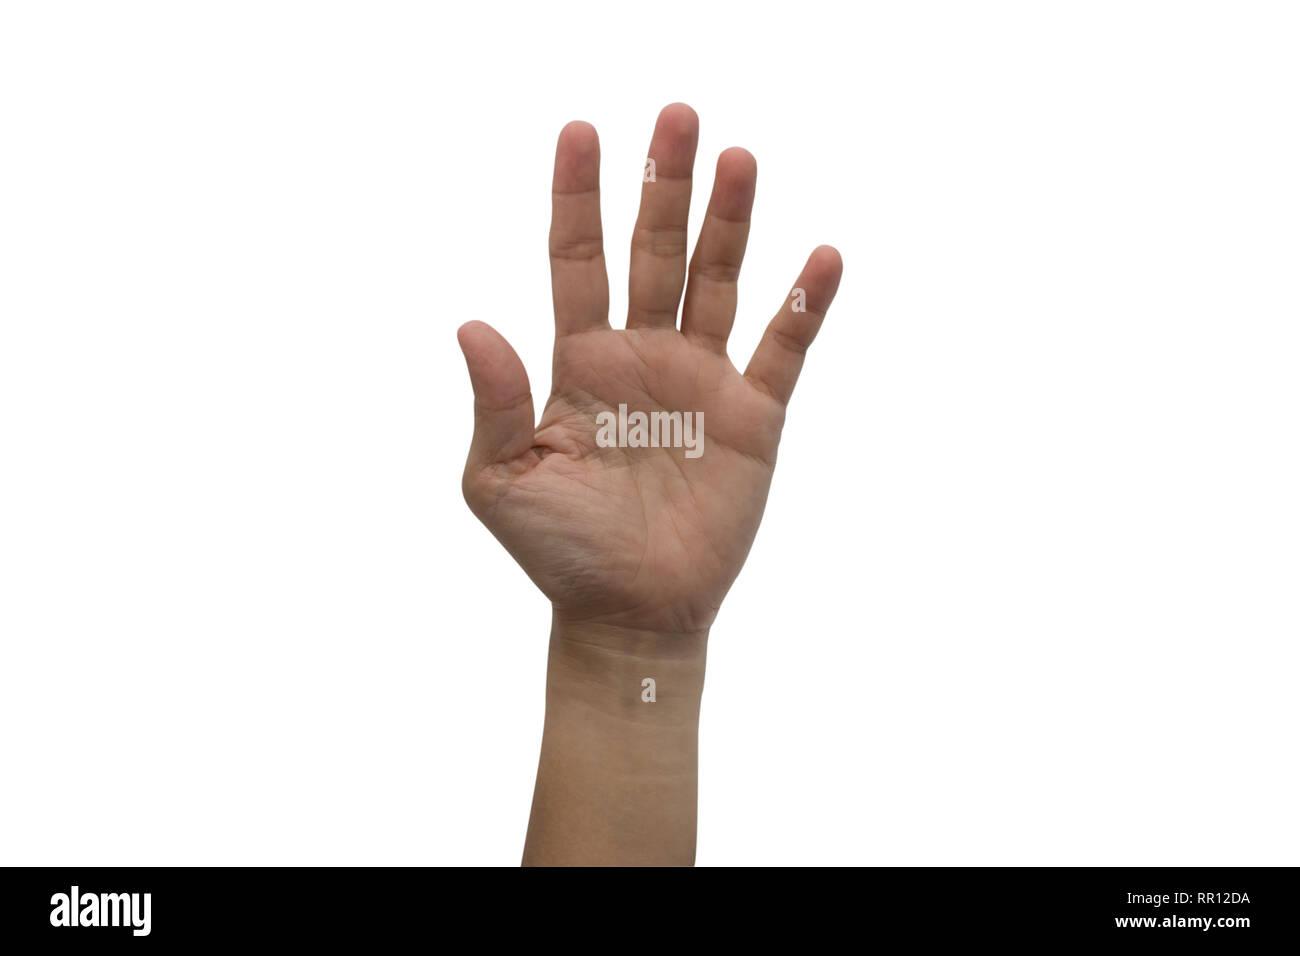 One hand raised high up isolated on white background. Stock Photo